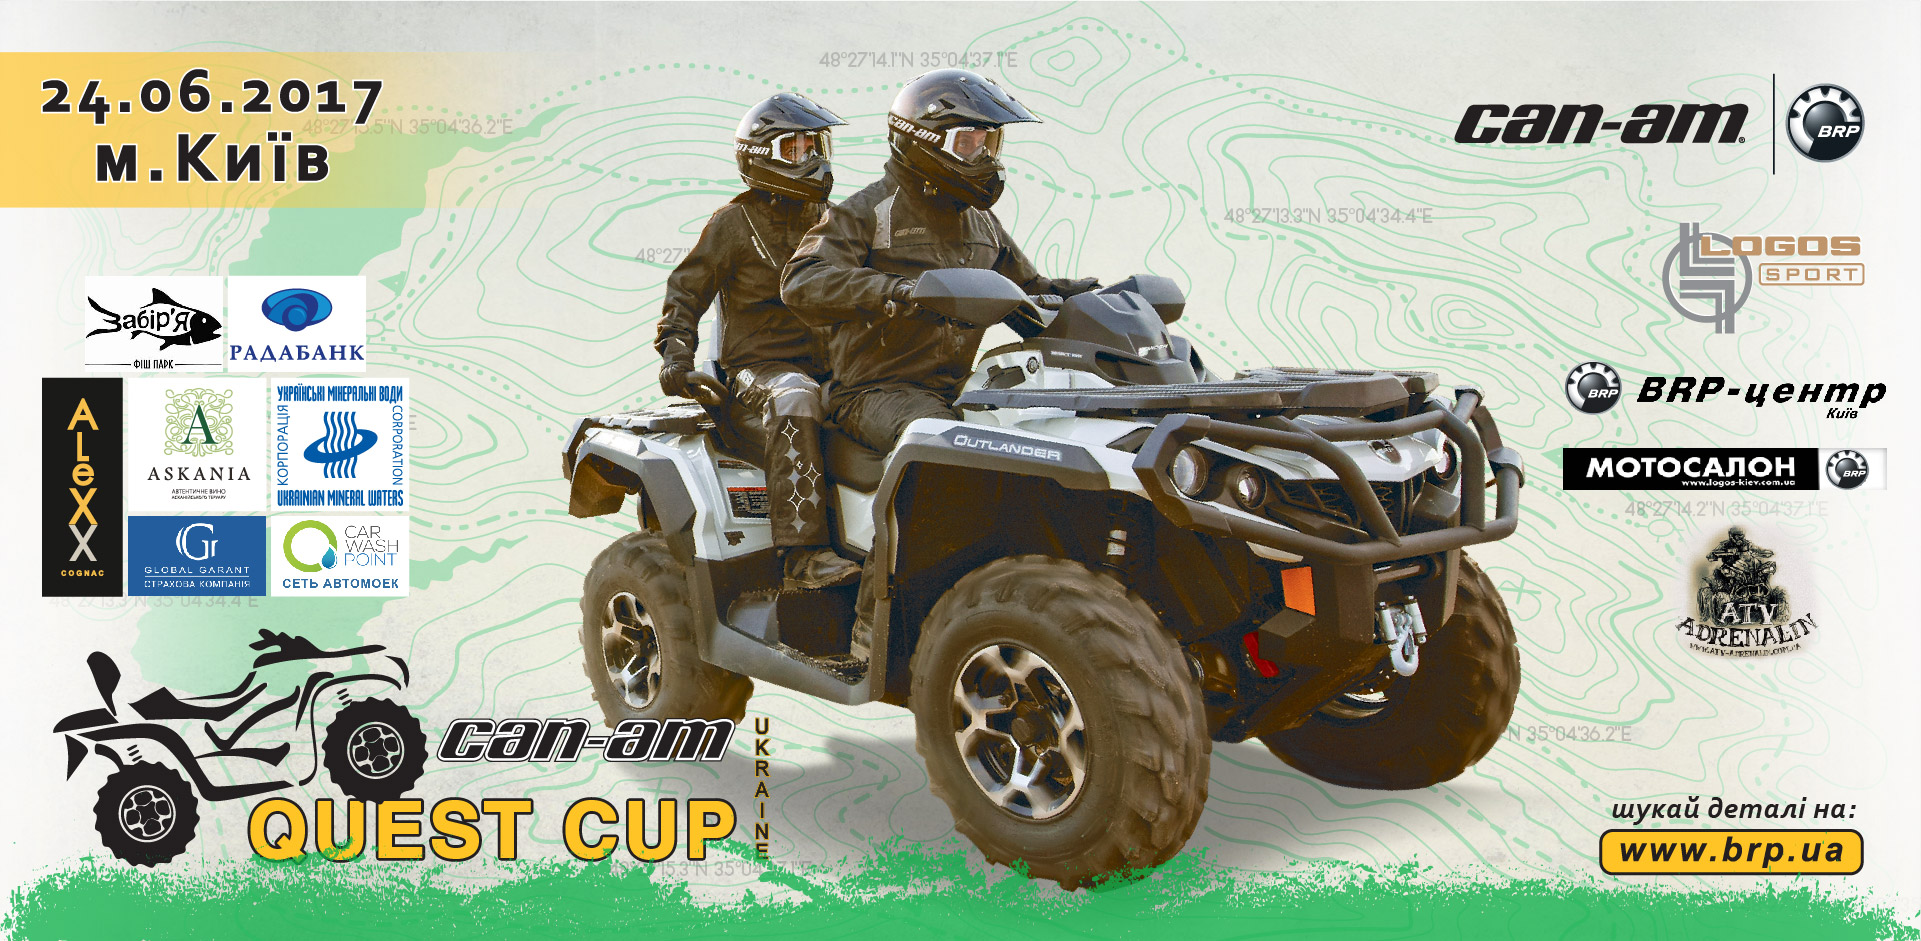 24/06. Третій  етап серії «CAN-AM QUEST CUP»! Київ.